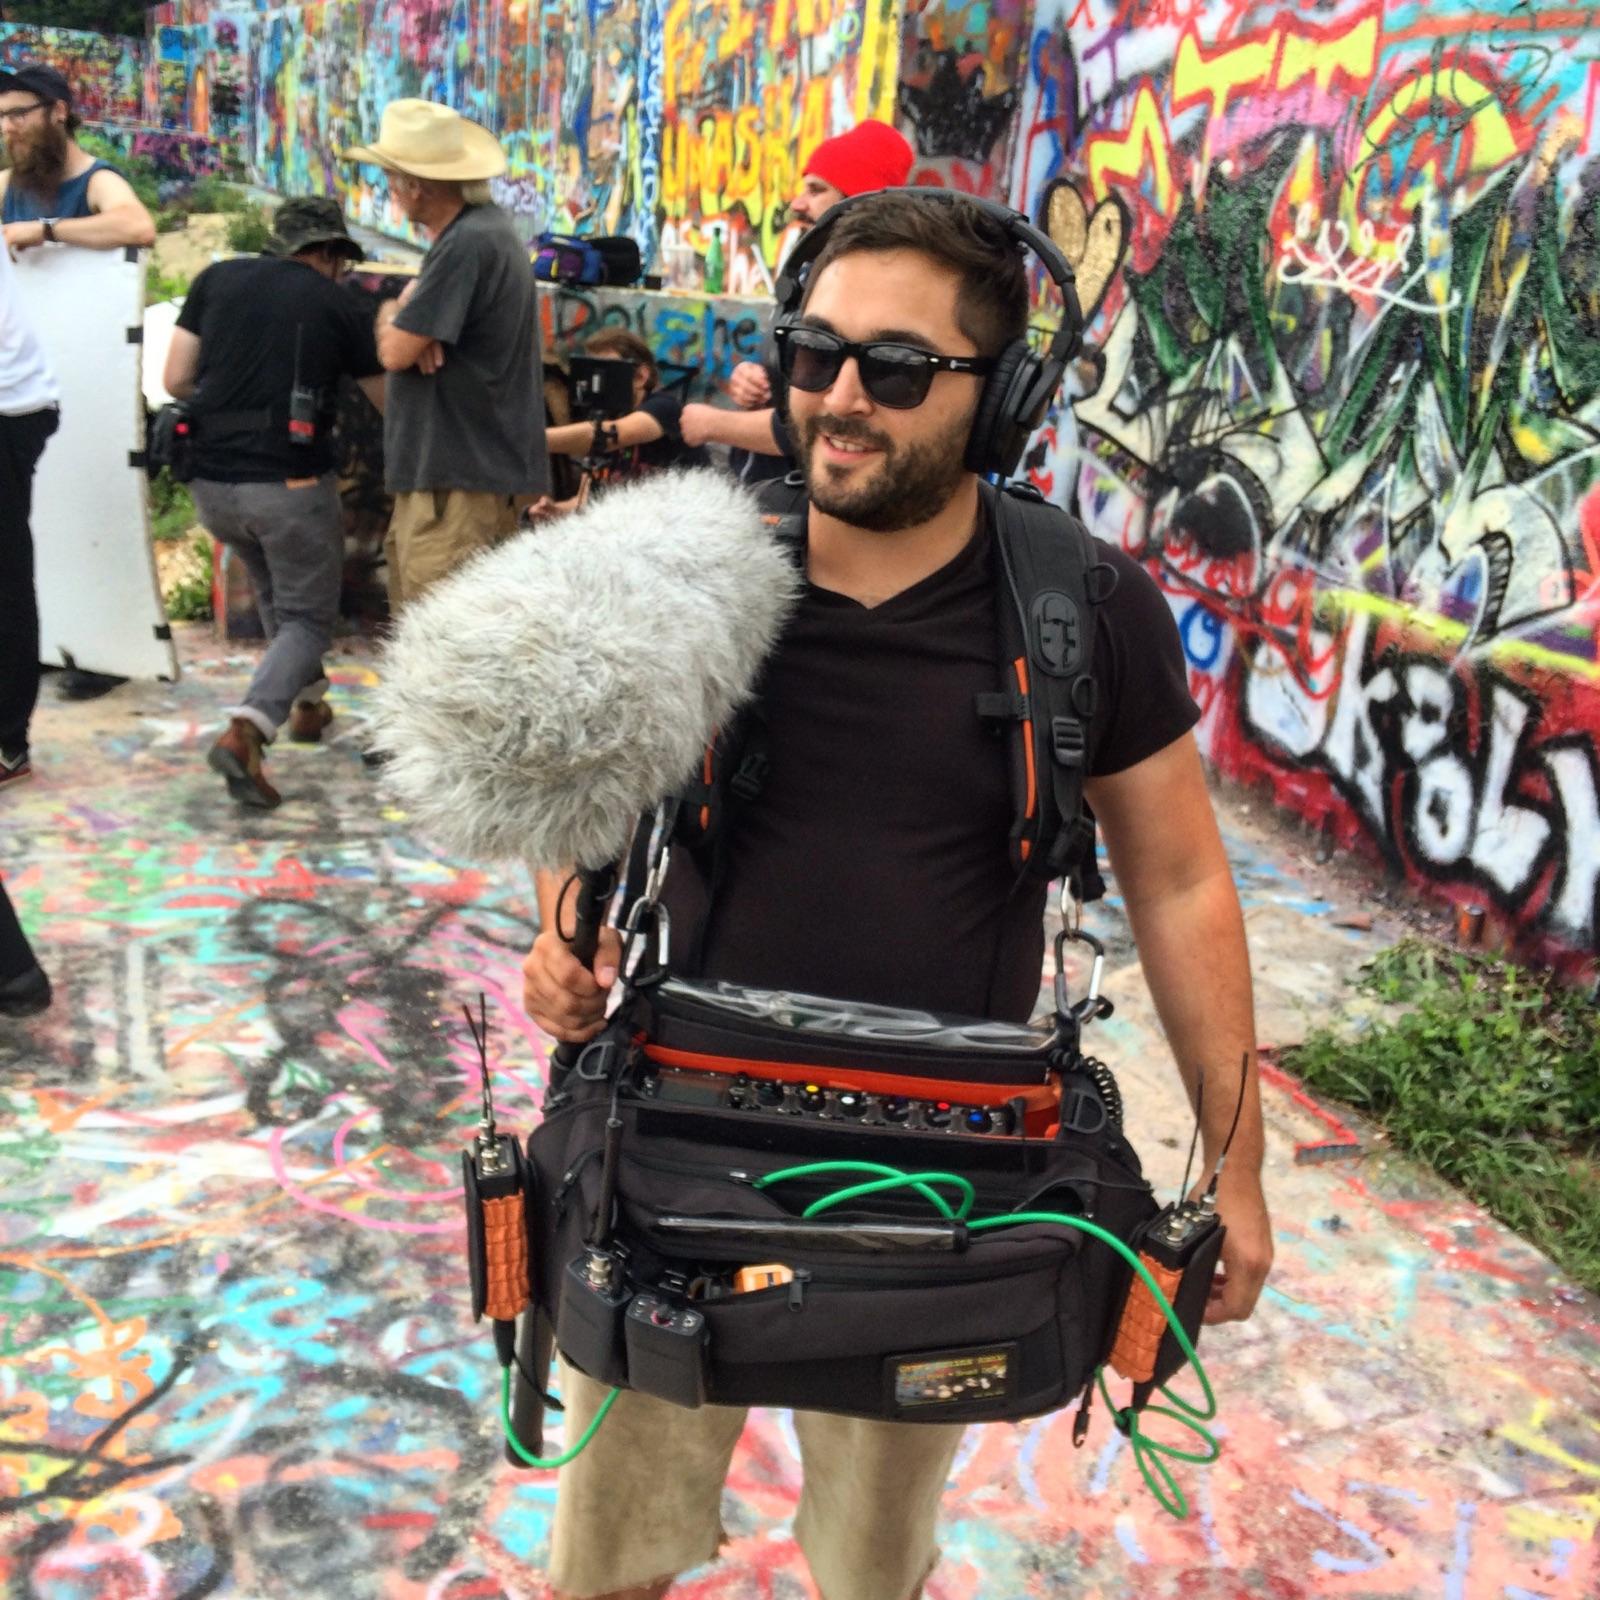 Cabel Adkins Audio Location Sound Sound Design Graffiti